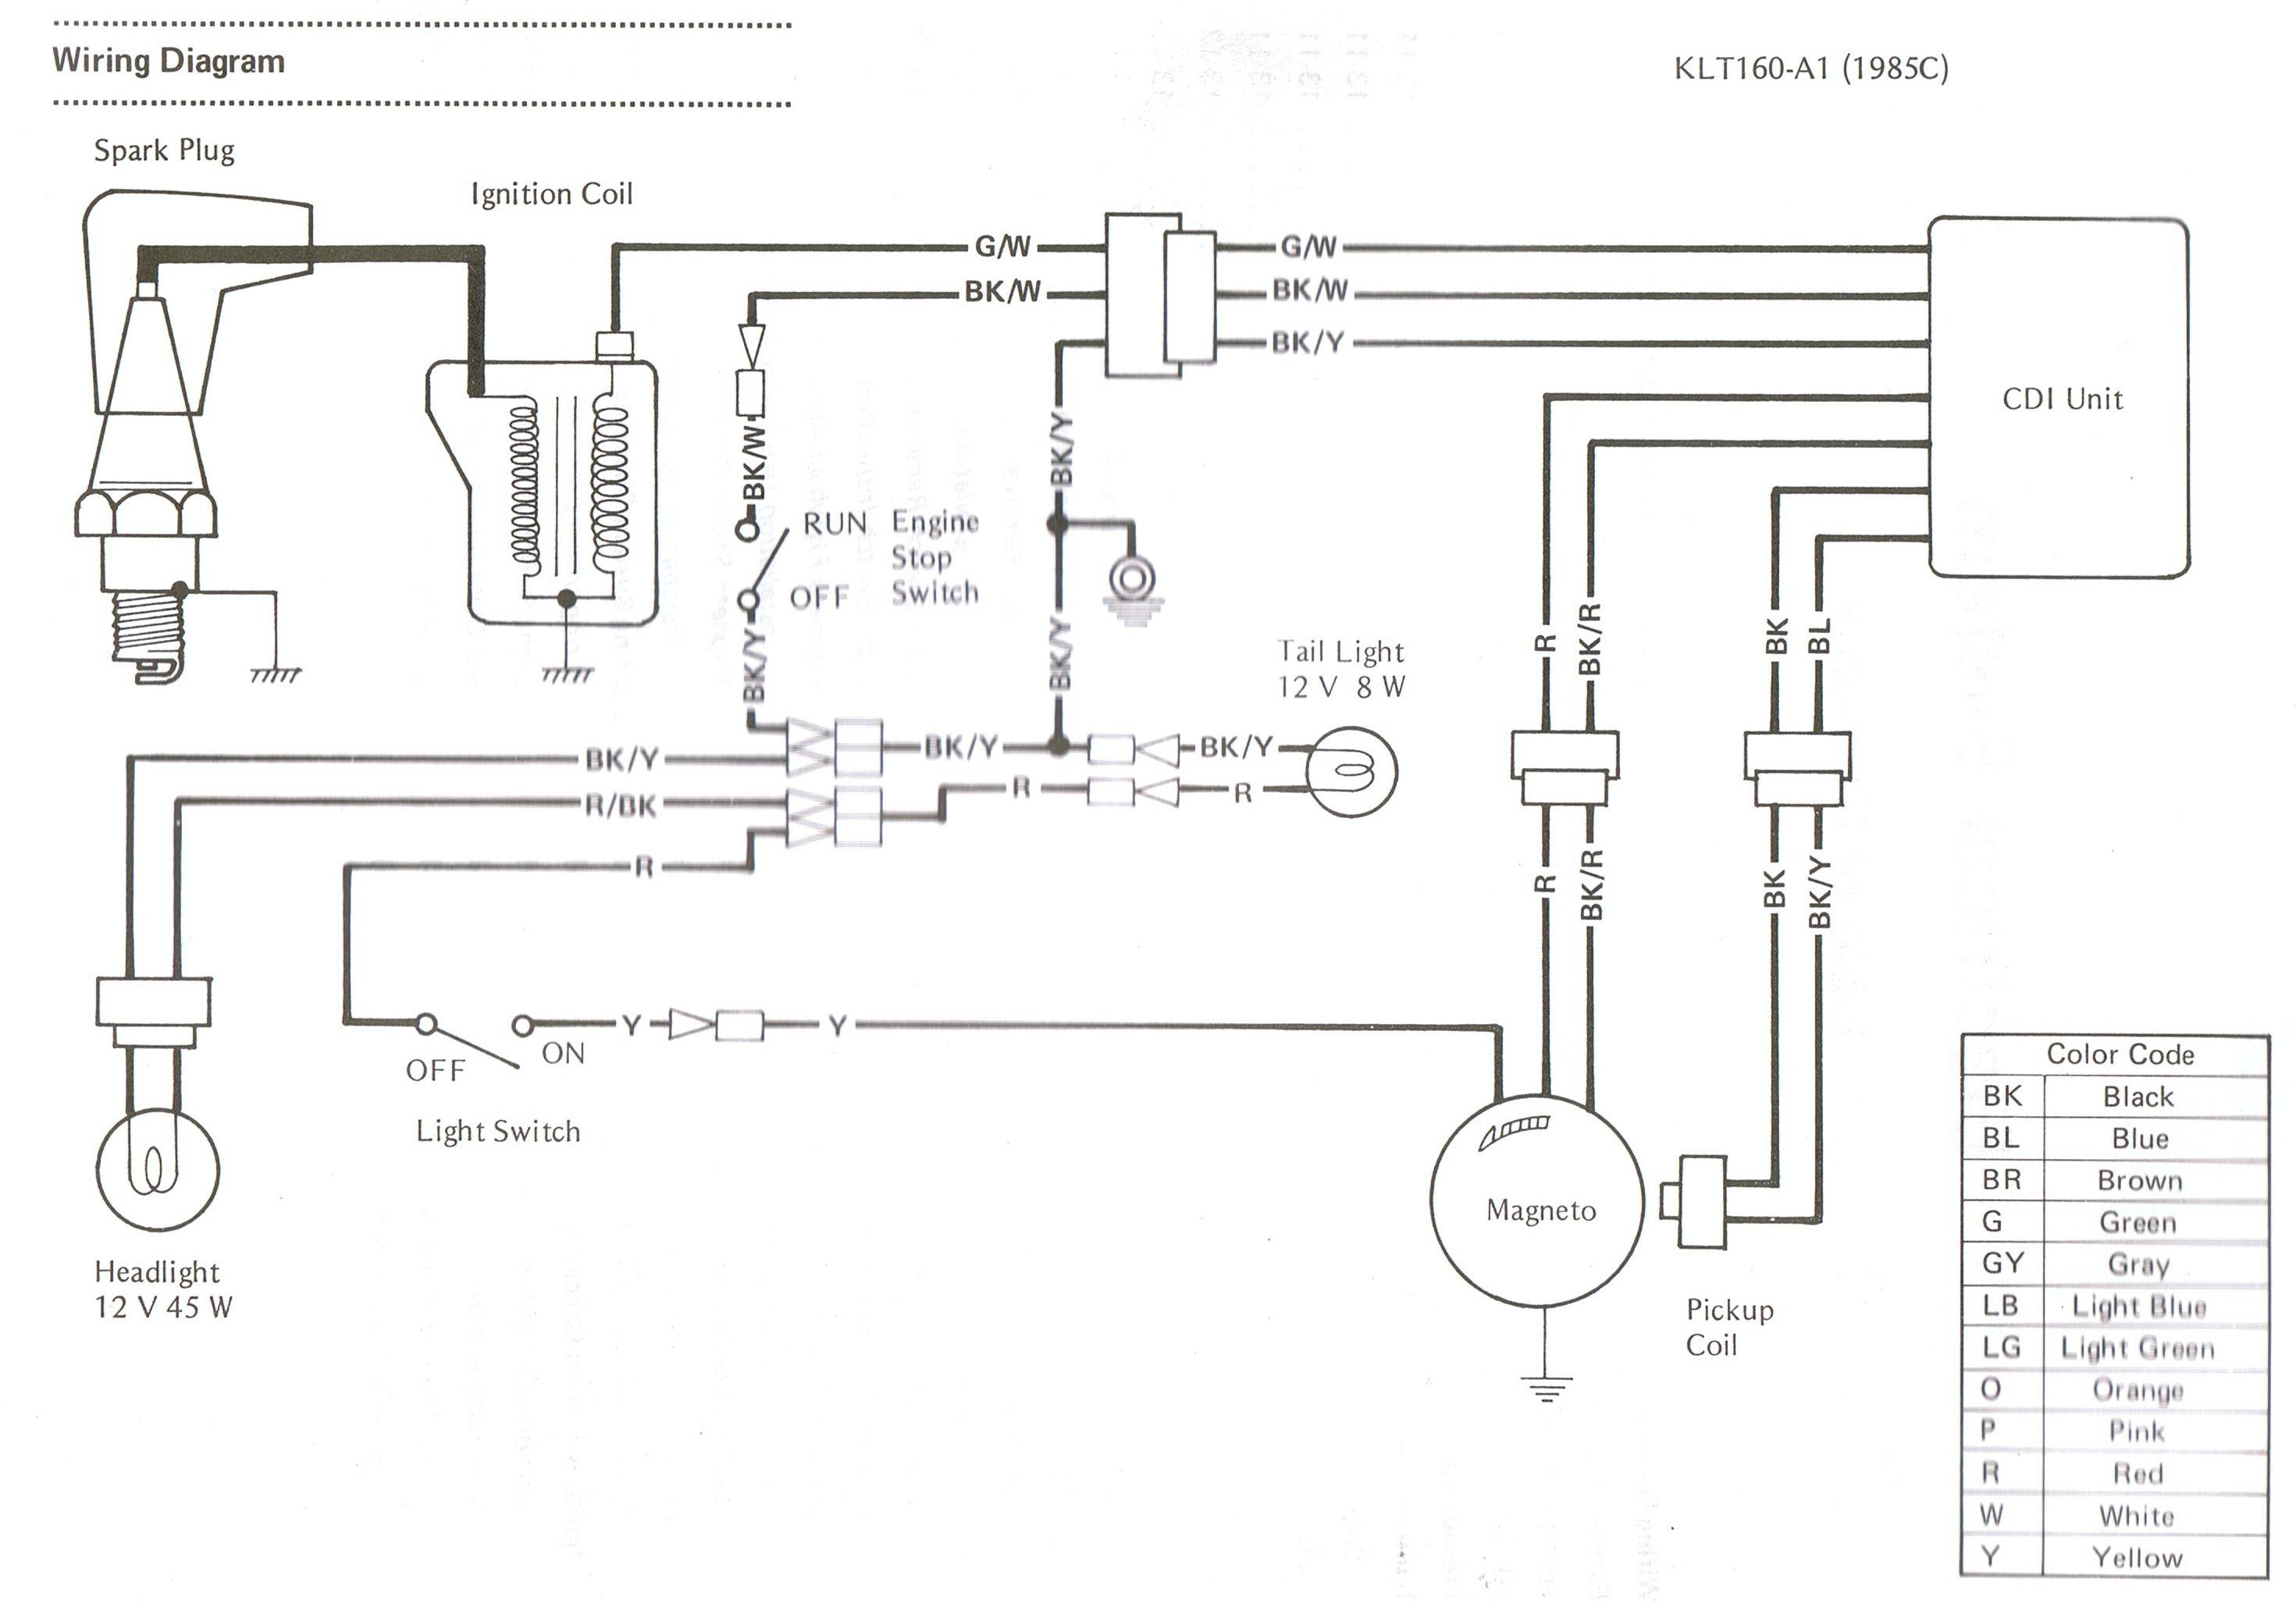 2000 Honda Foreman 400 Parts Diagram